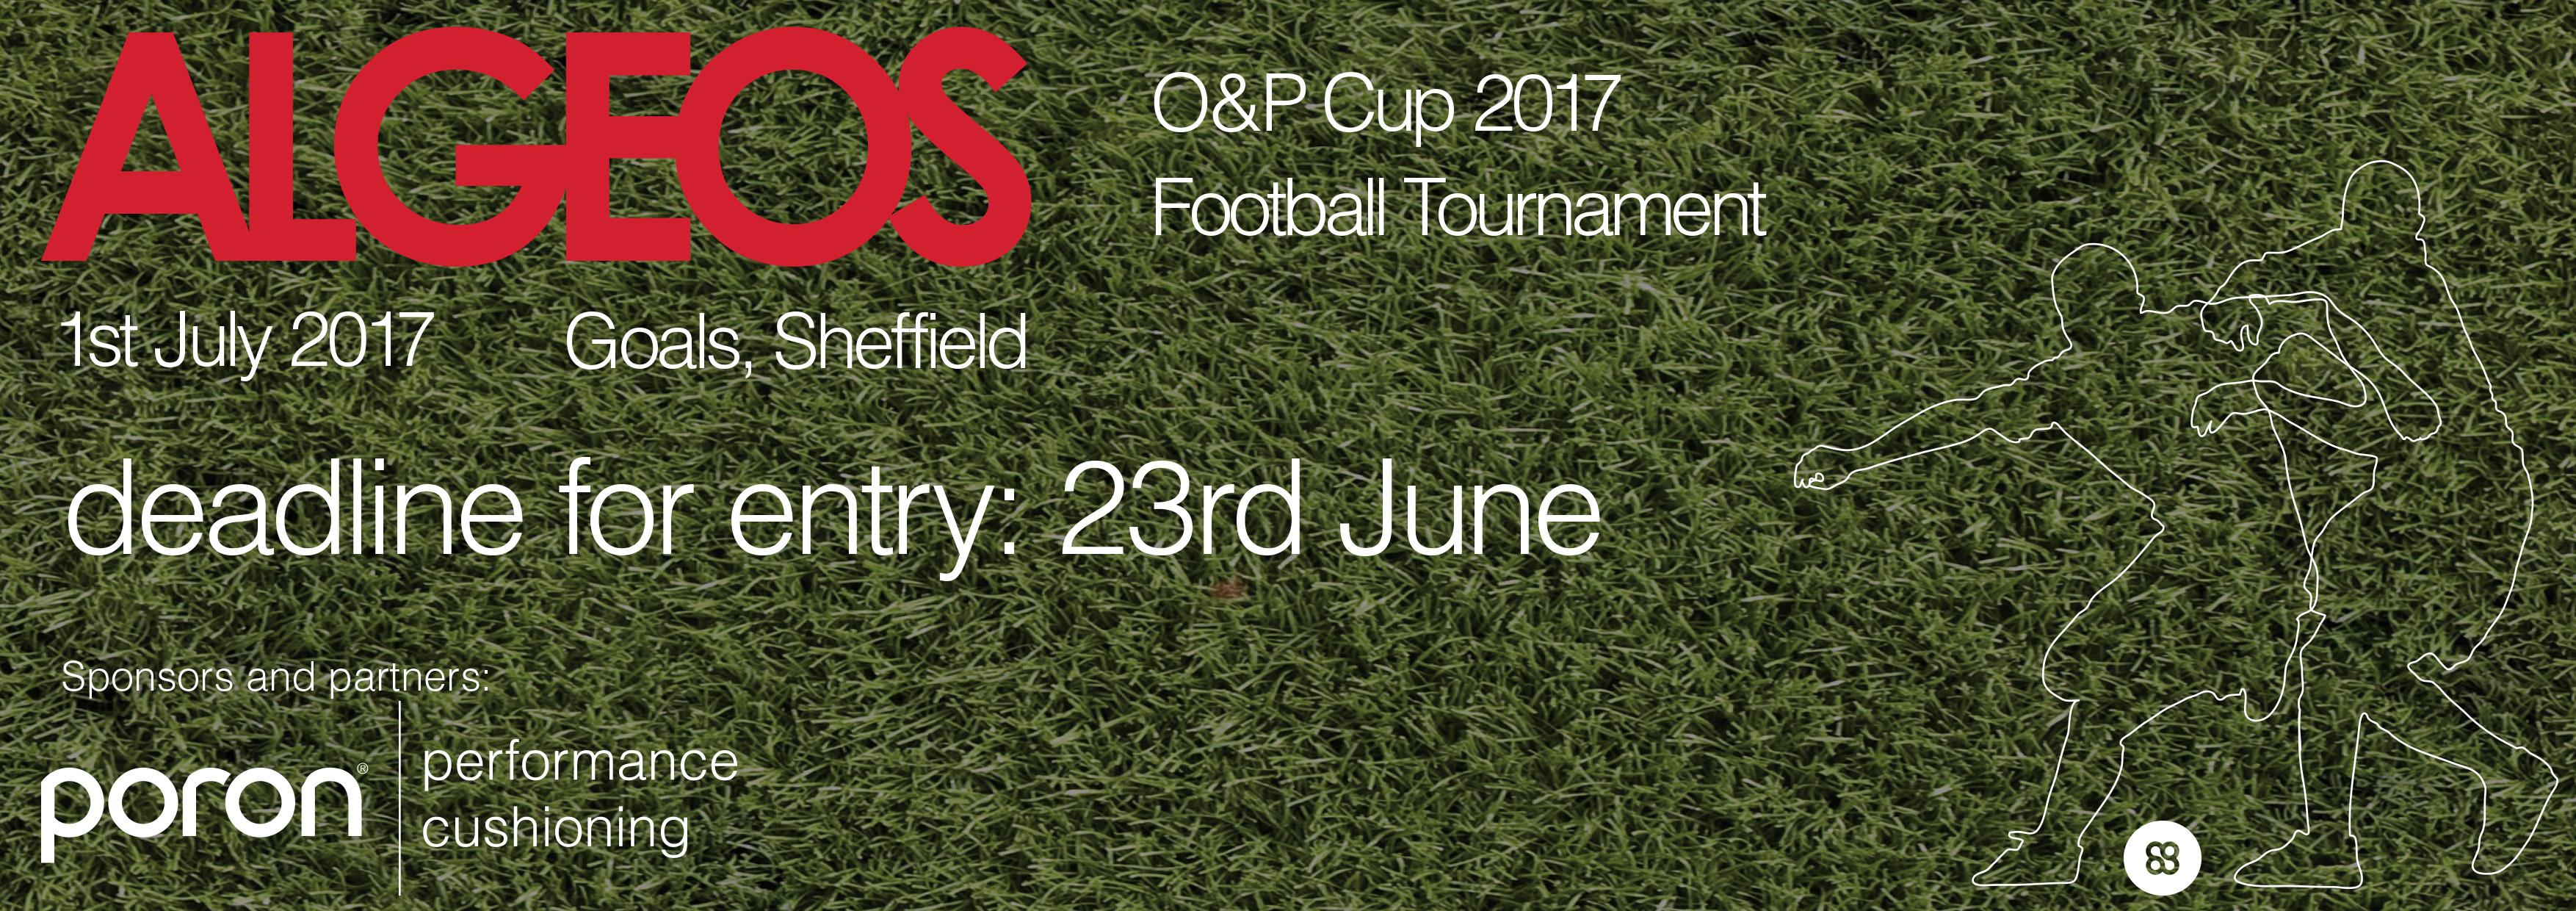 2ccfc3218 The Algeos O&P Cup 2017 Football Tournament